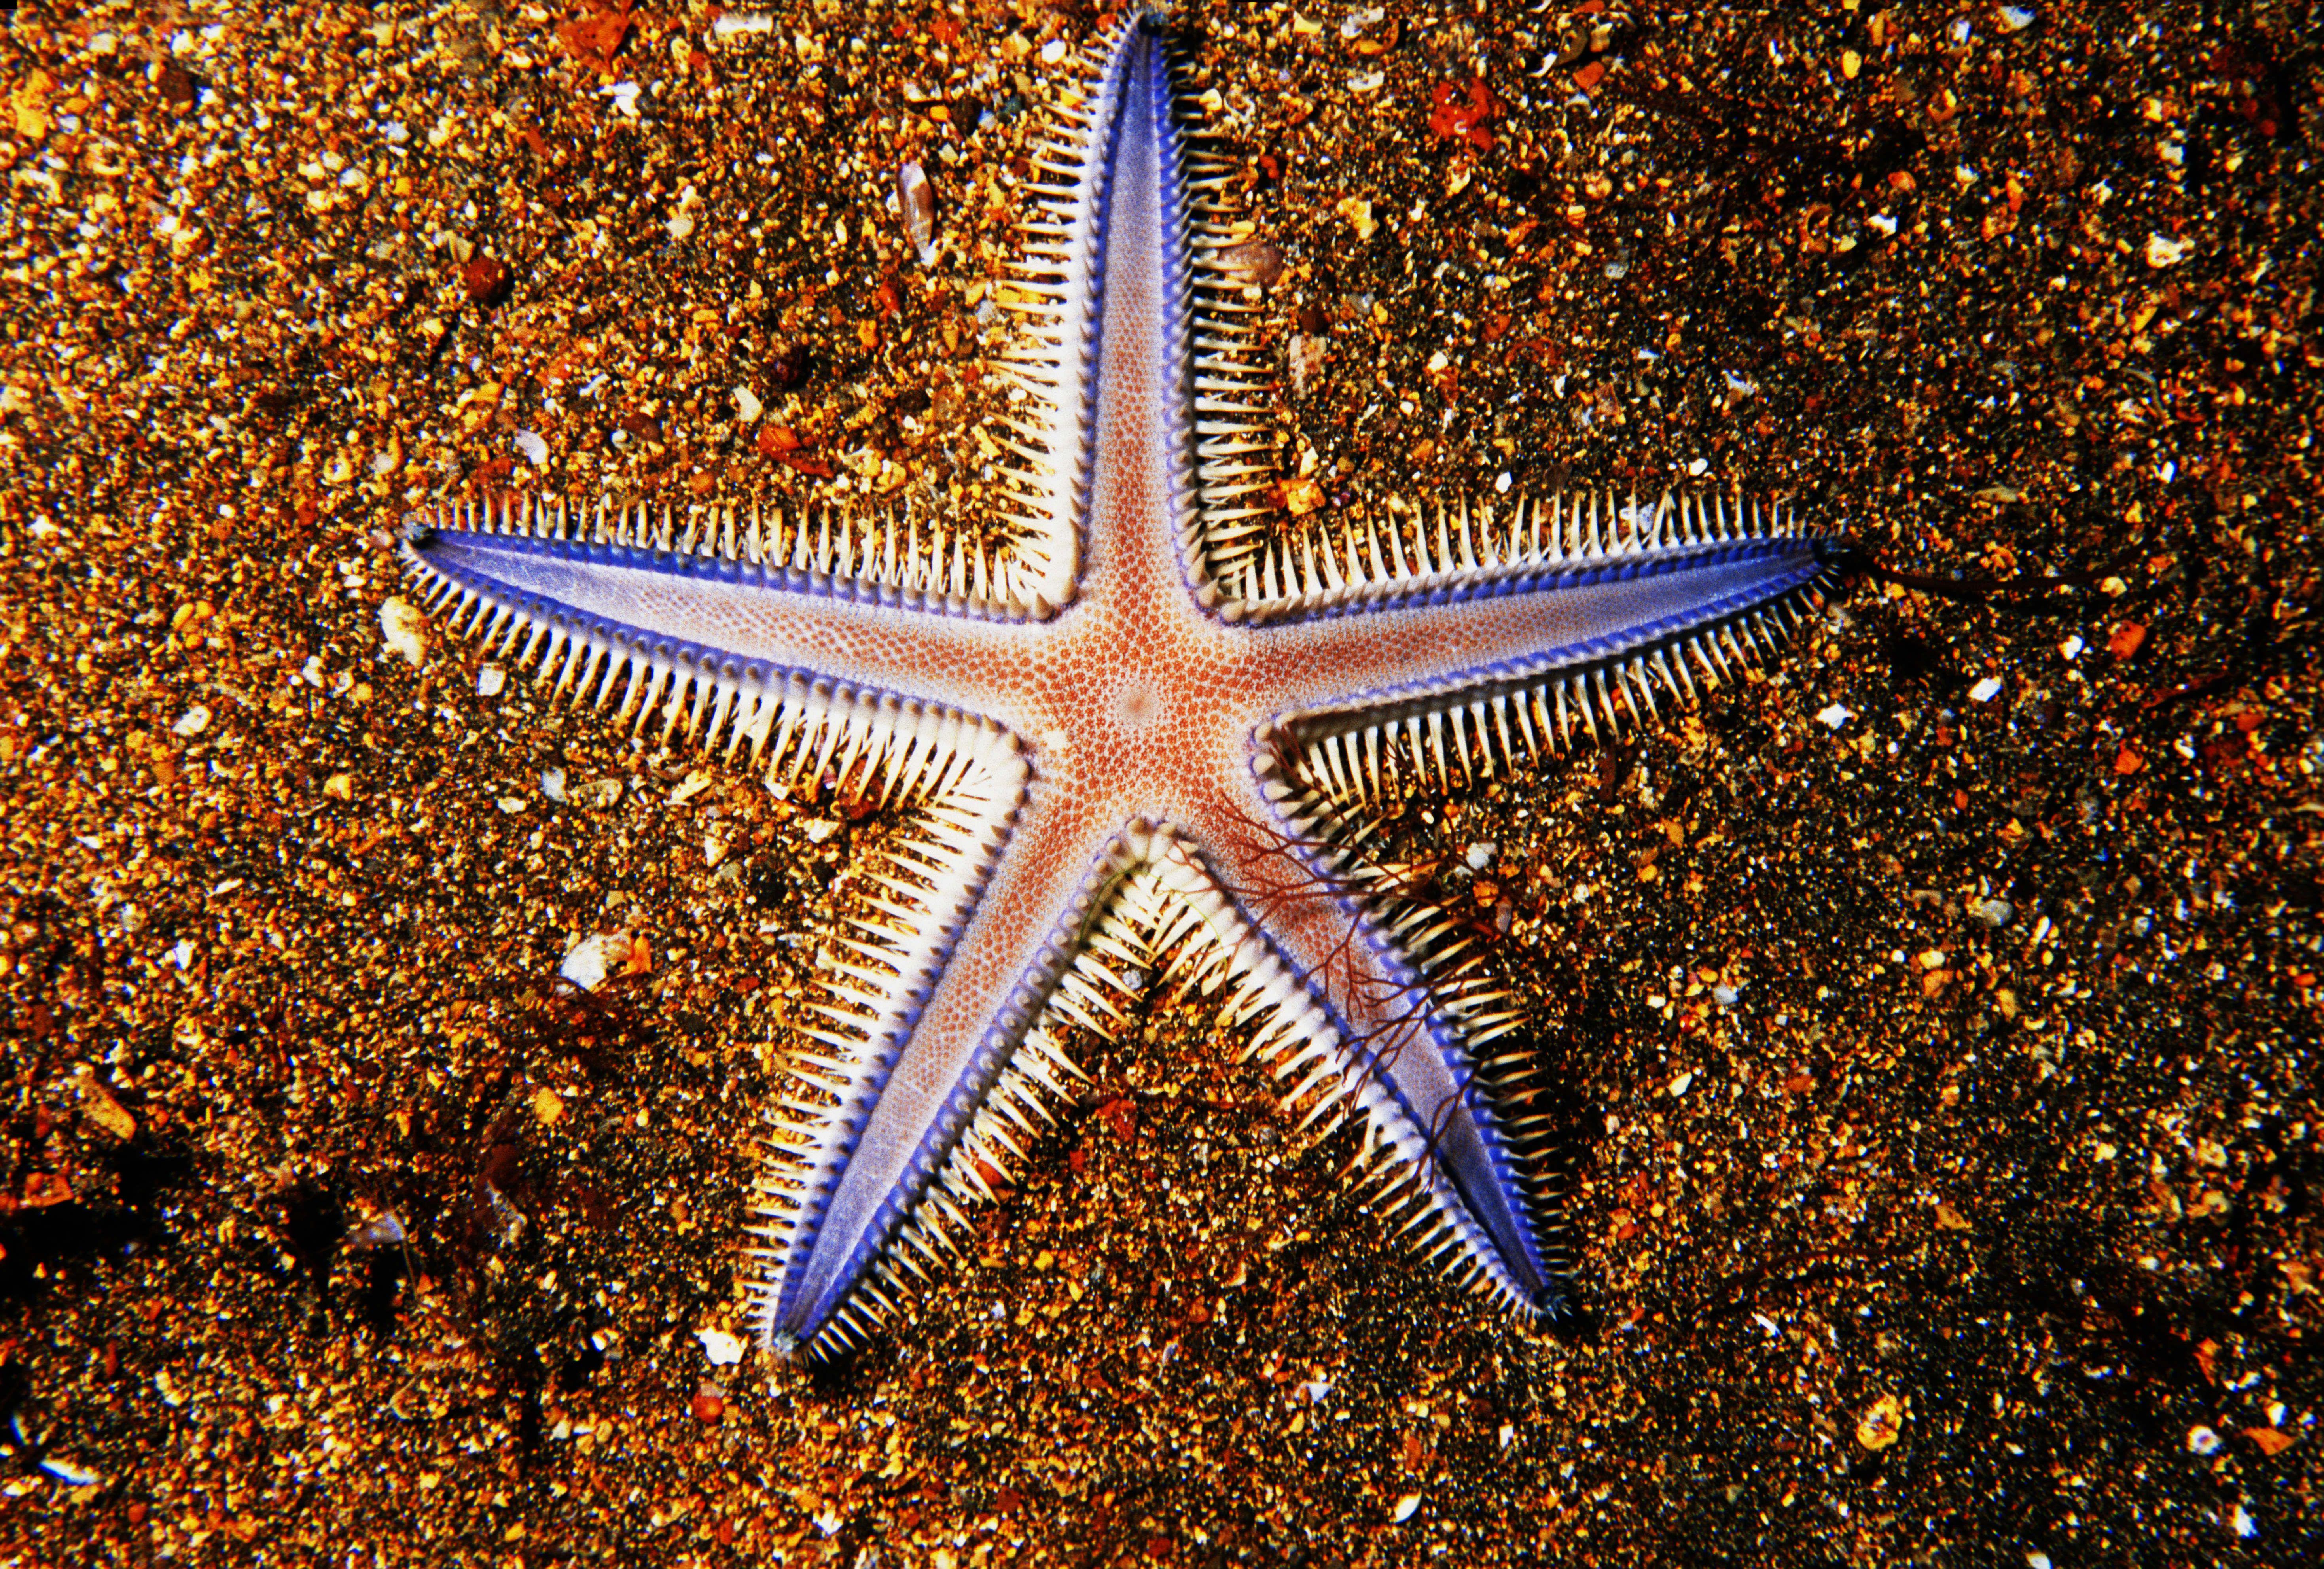 Galapagos, closeup of seastar on colorful sand.